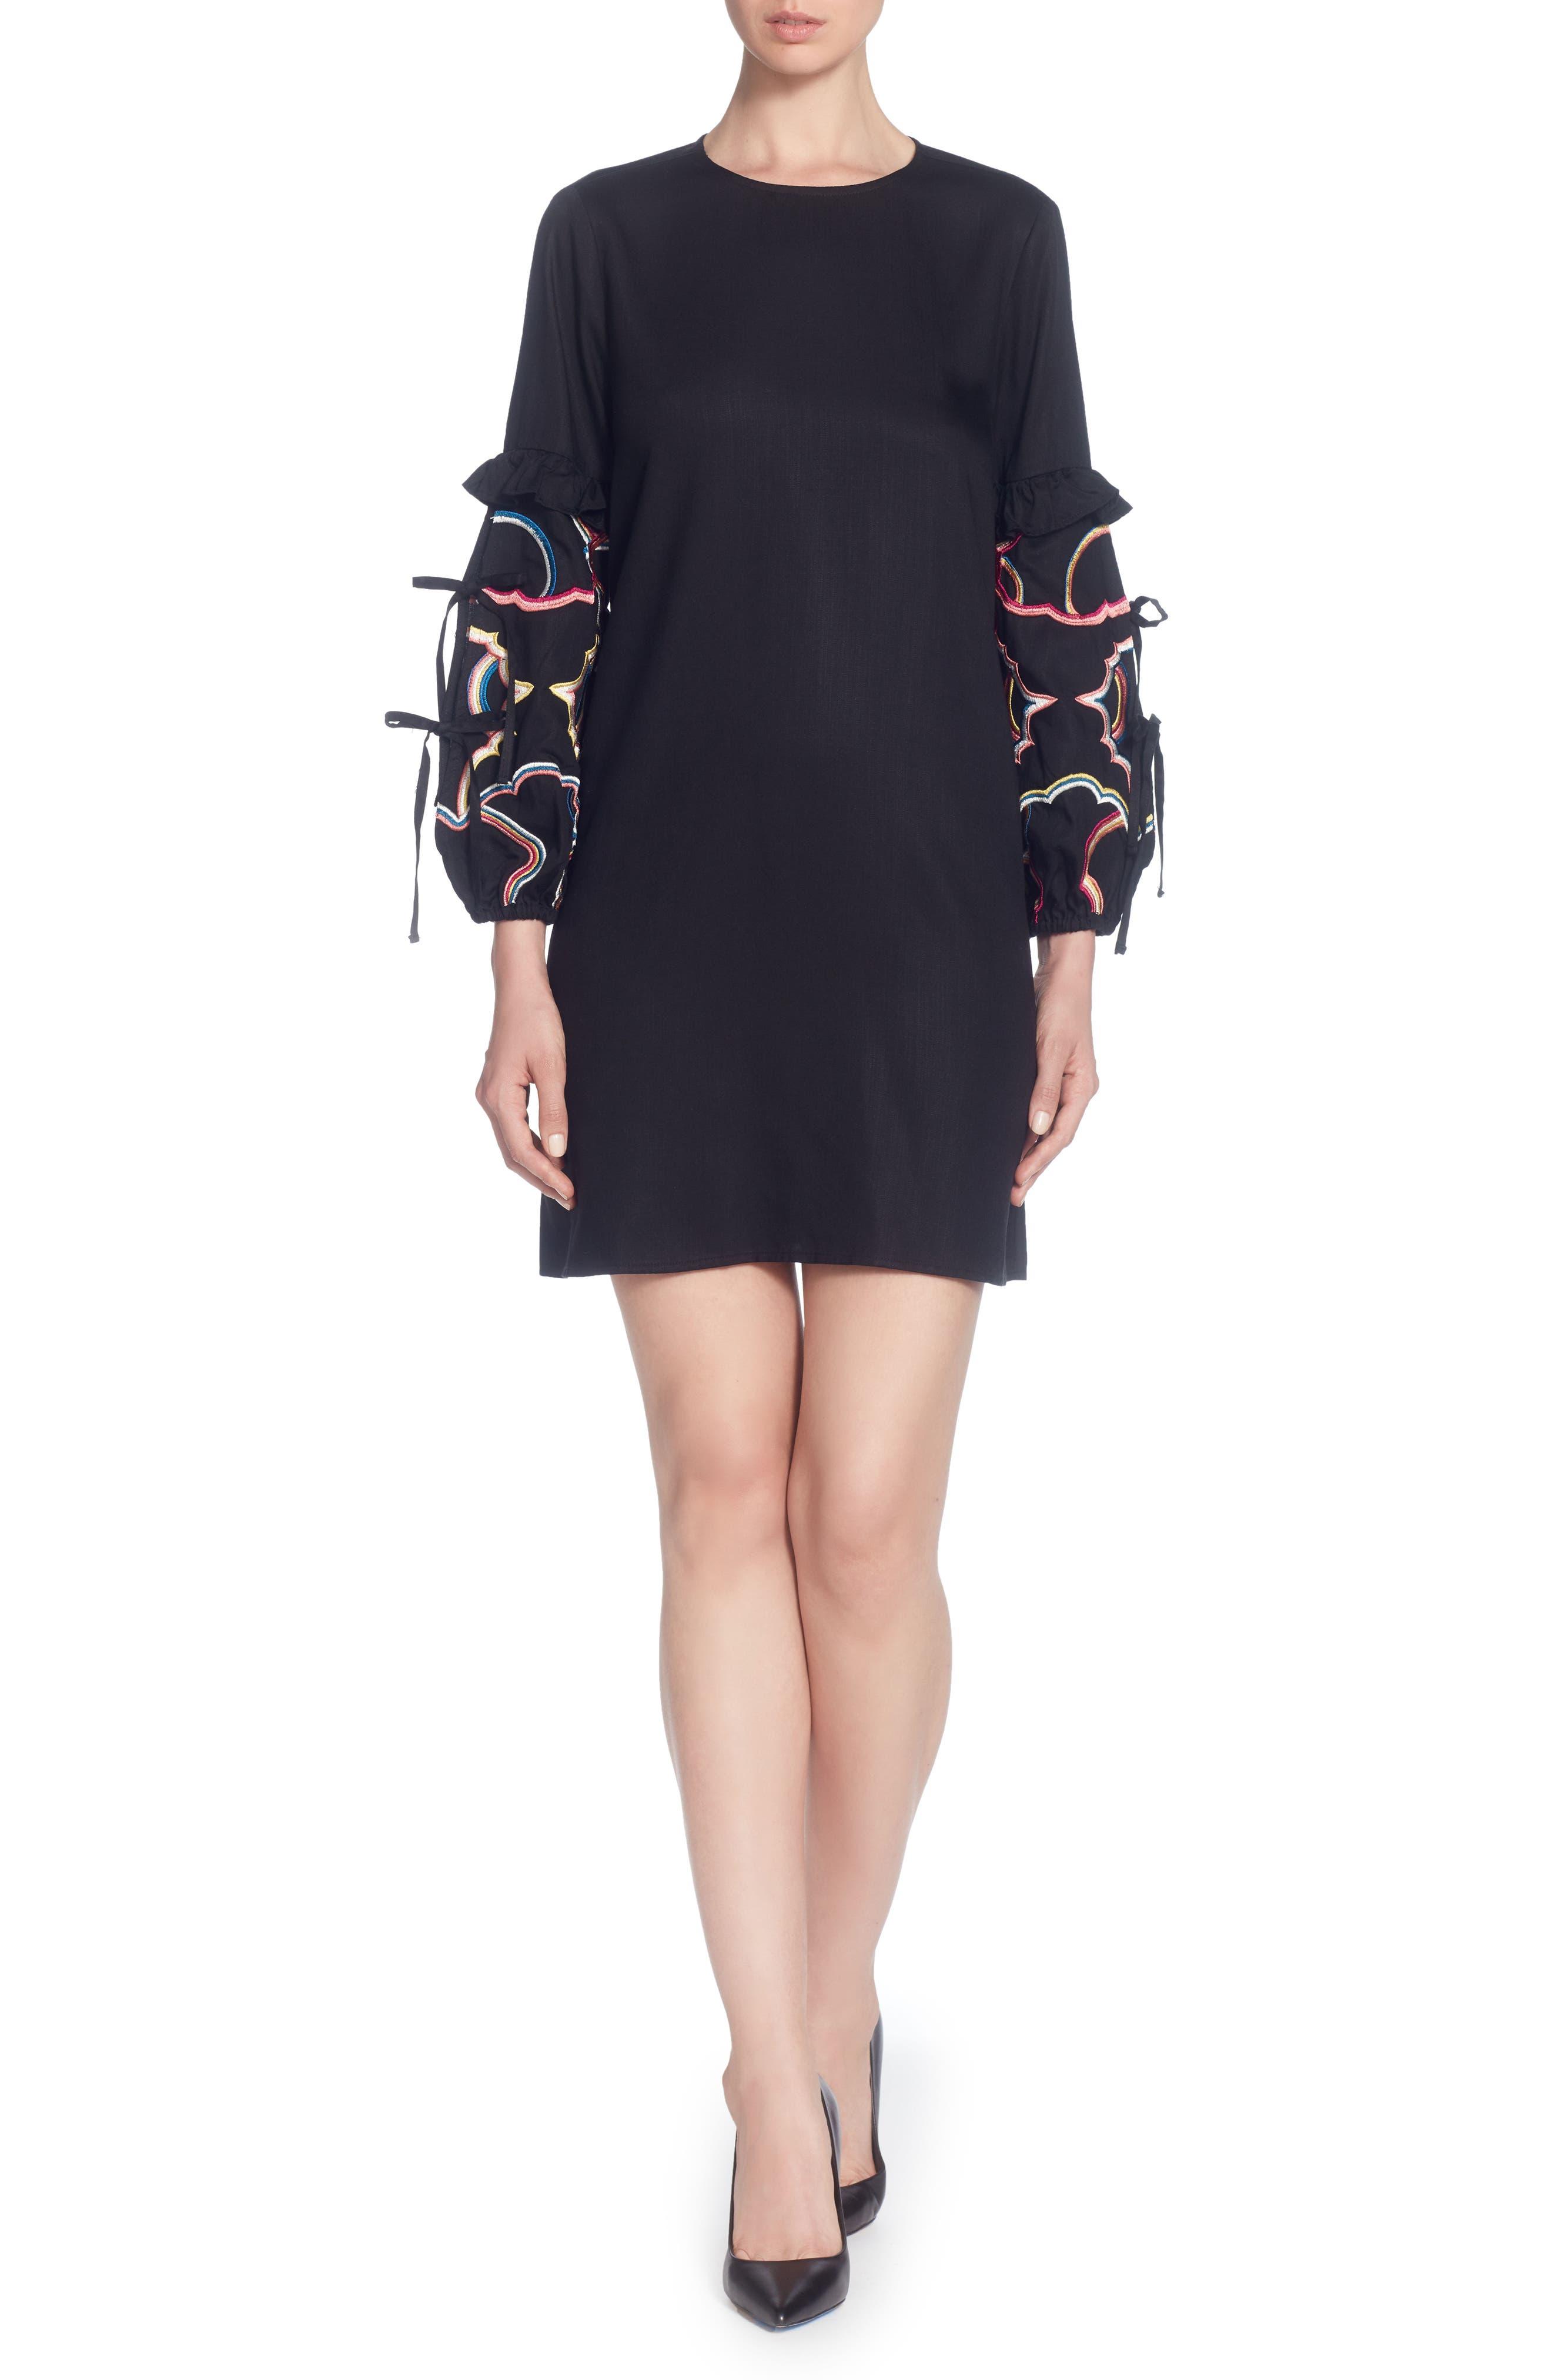 Main Image - Catherine Catherine Malandrino Dahl Embroidered Sleeve Dress